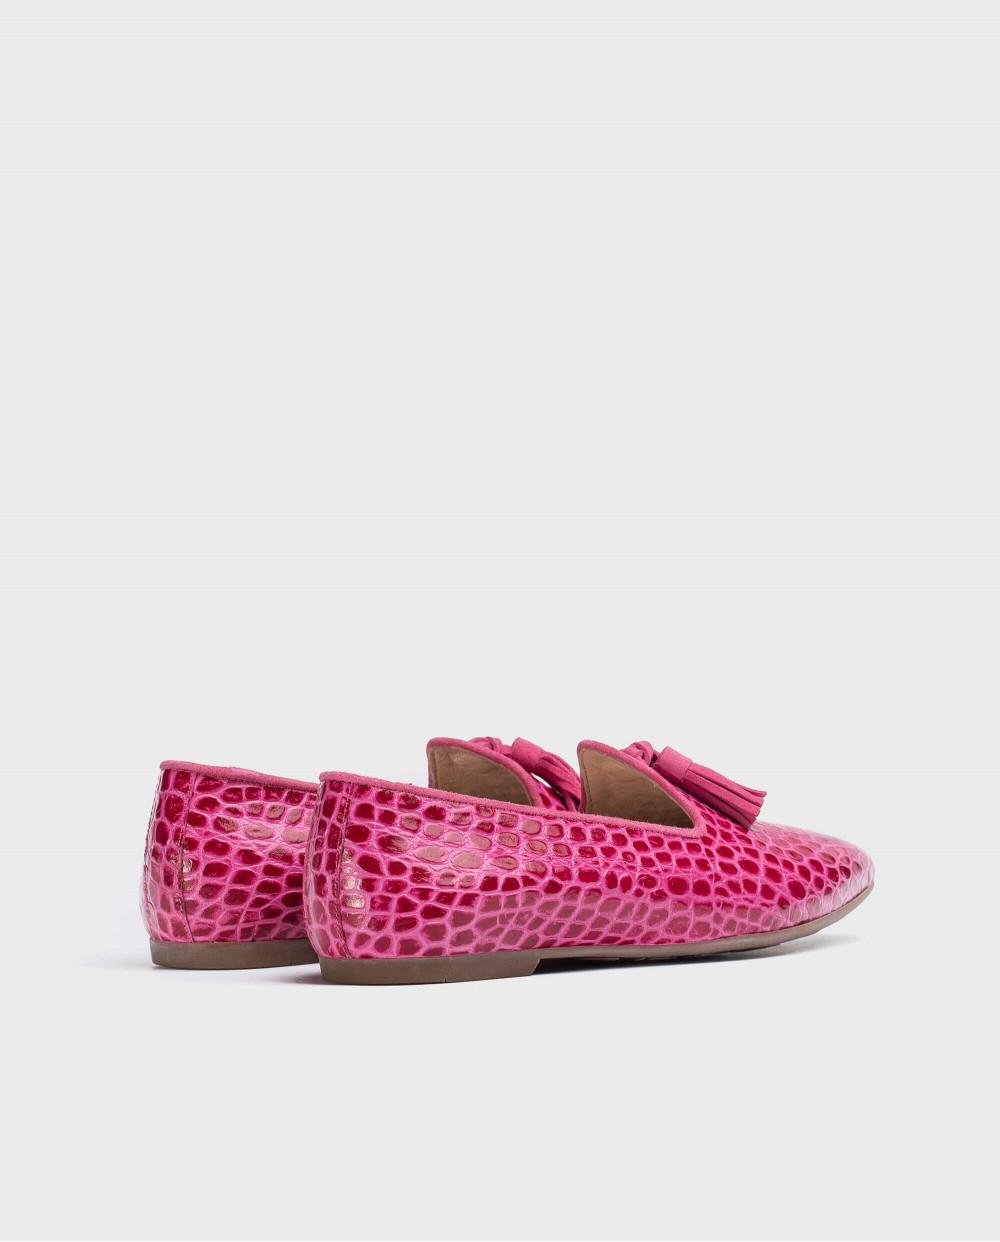 Wonders-Flat Shoes-Embossed leather slipper